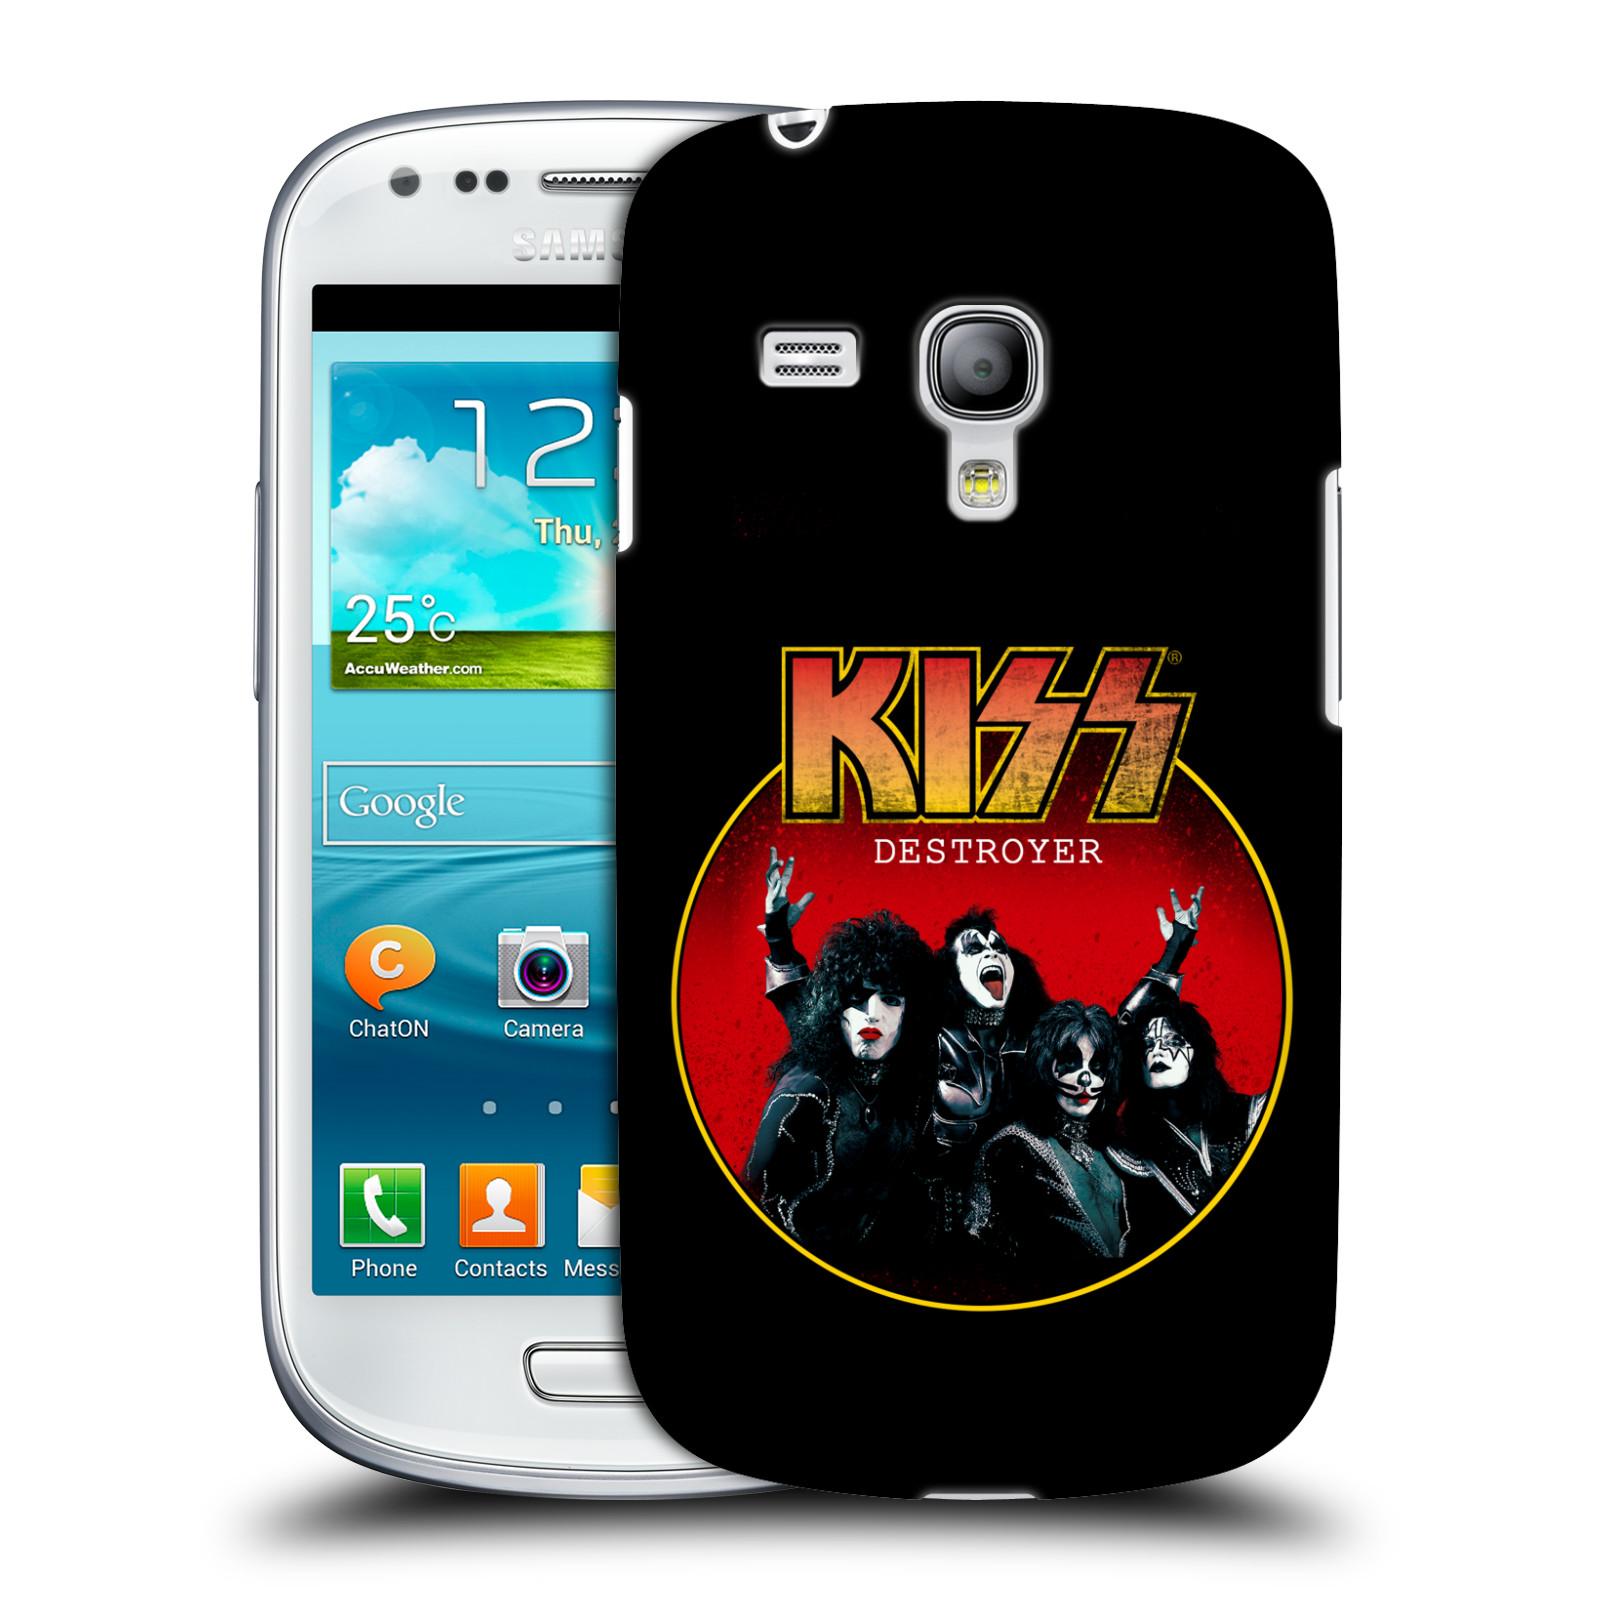 Silikonové pouzdro na mobil Samsung Galaxy S III Mini VE HEAD CASE - Kiss - Destroyer (Plastový kryt či obal na mobilní telefon s licencovaným motivem Kiss pro Samsung Galaxy S3 Mini VE GT-i8200)